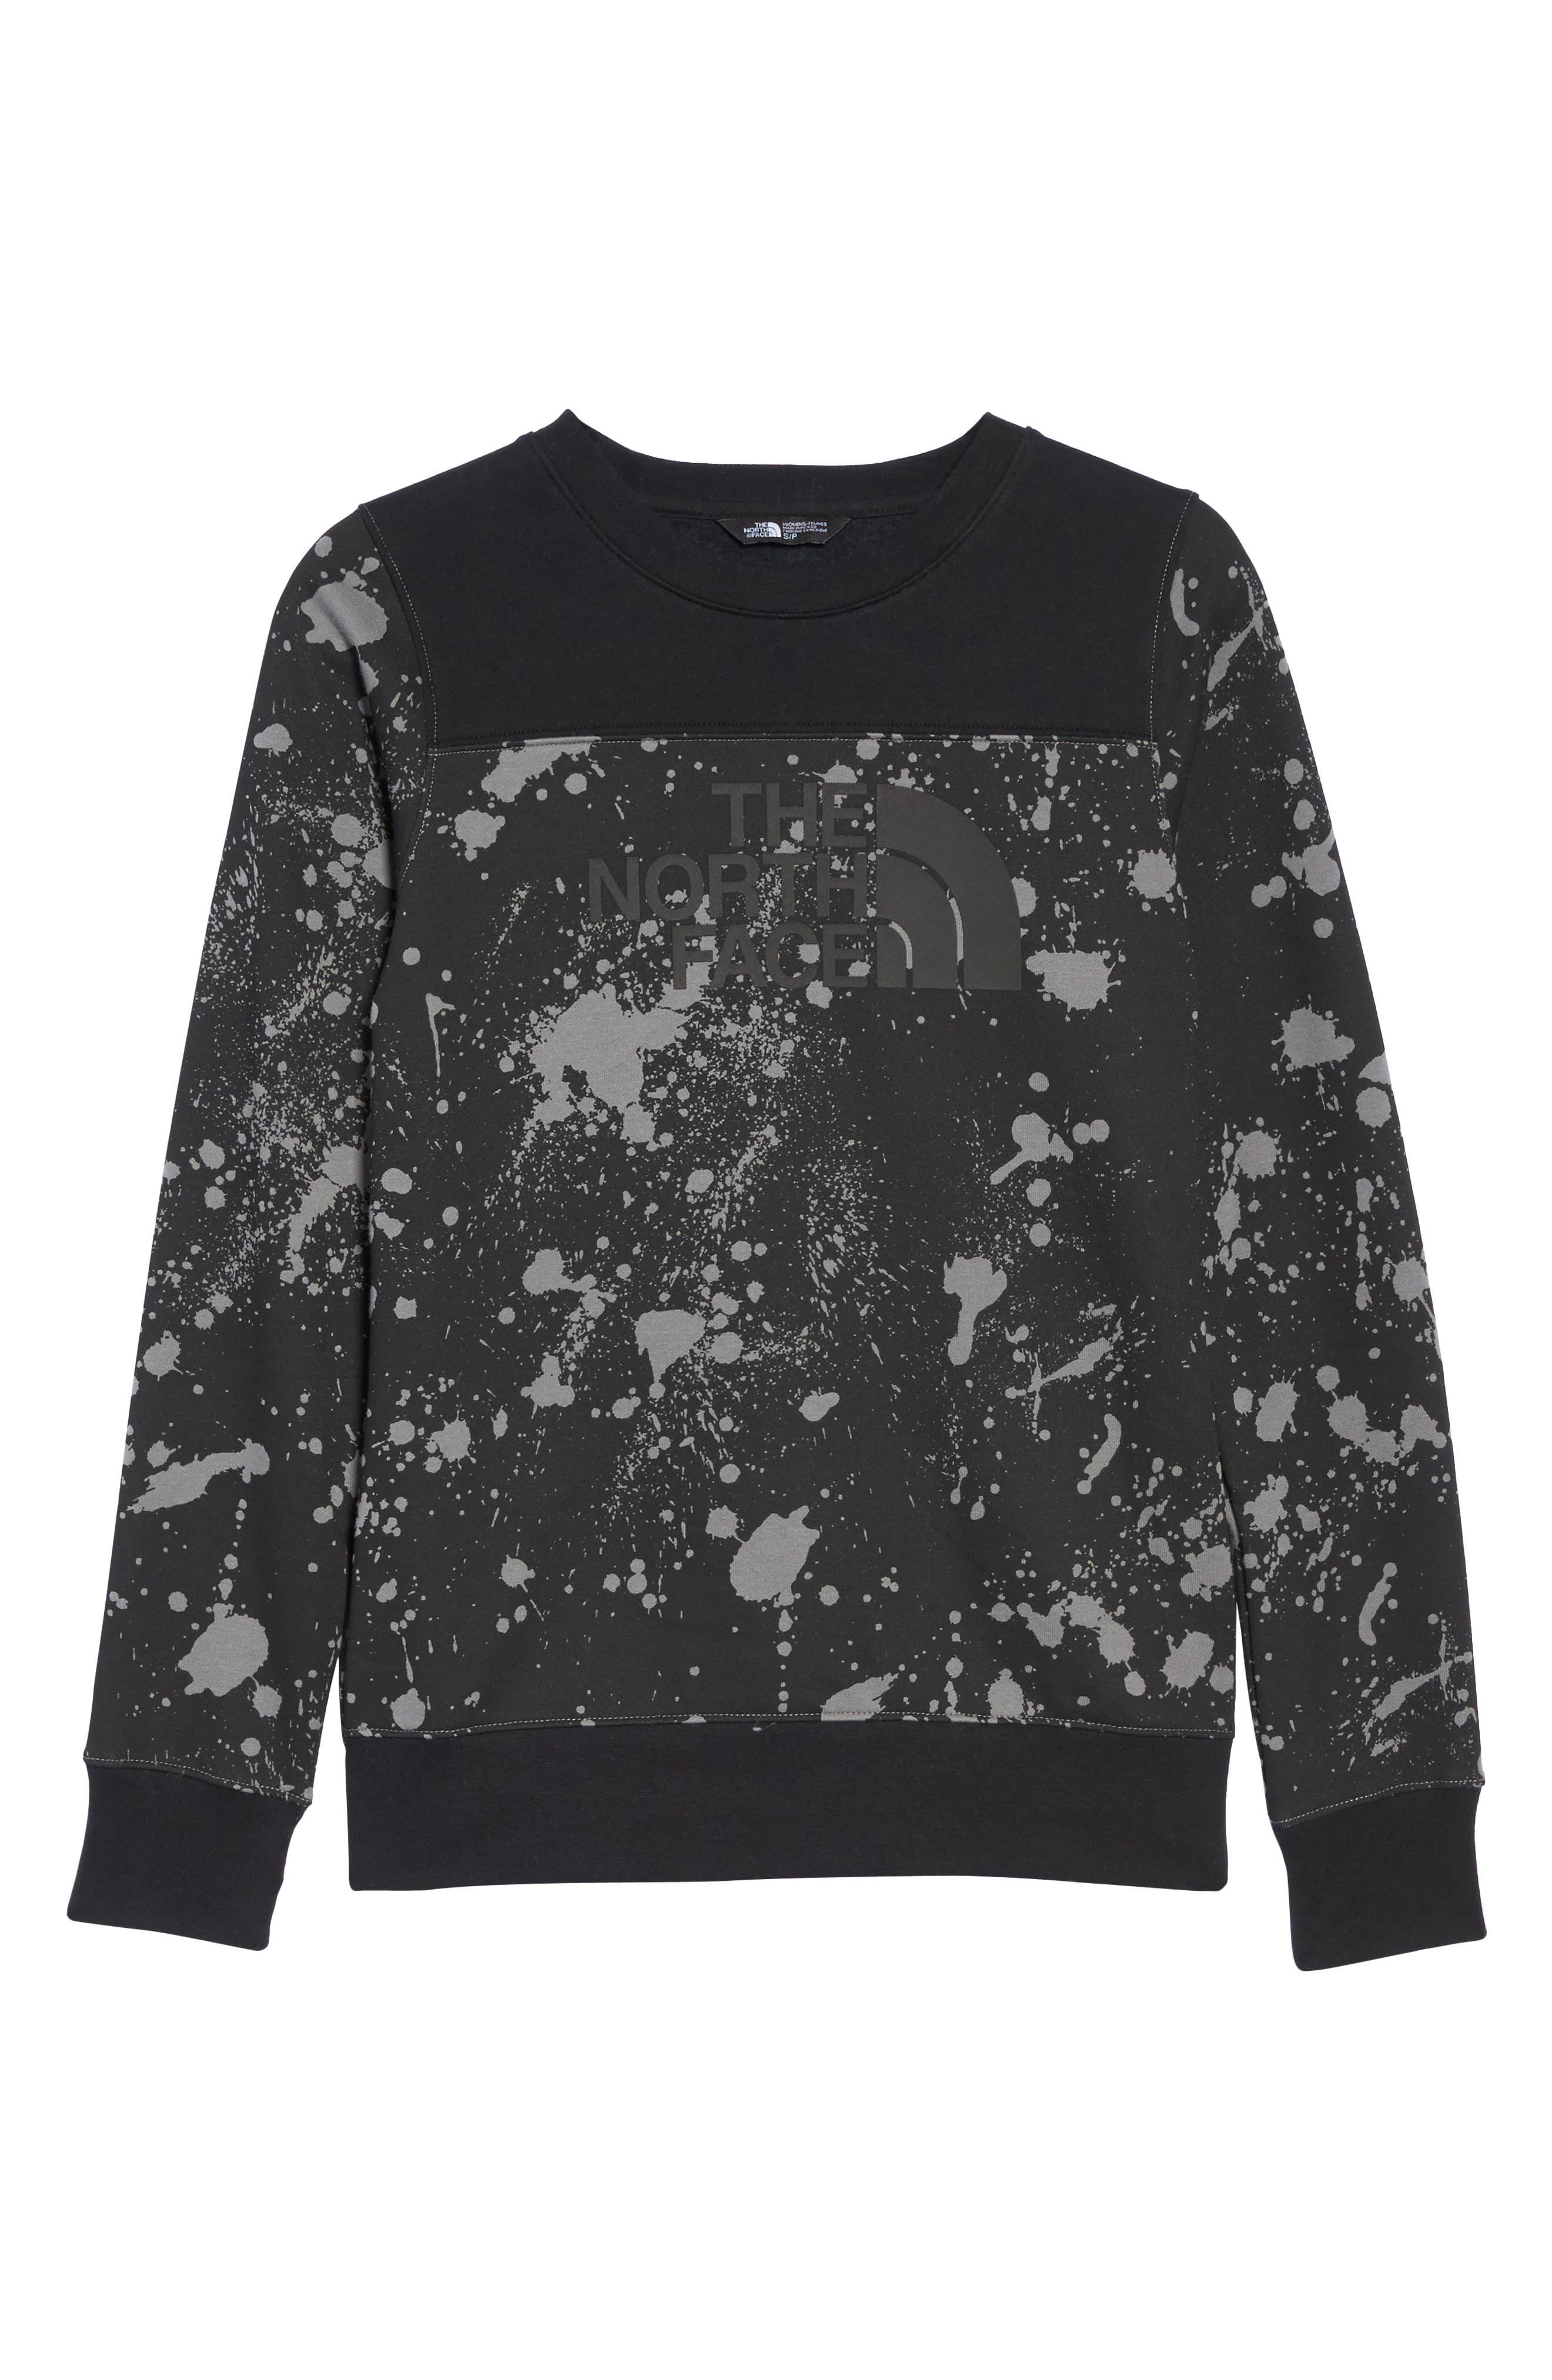 Half Dome Sweatshirt,                             Alternate thumbnail 7, color,                             Tnf Black Splatter Print